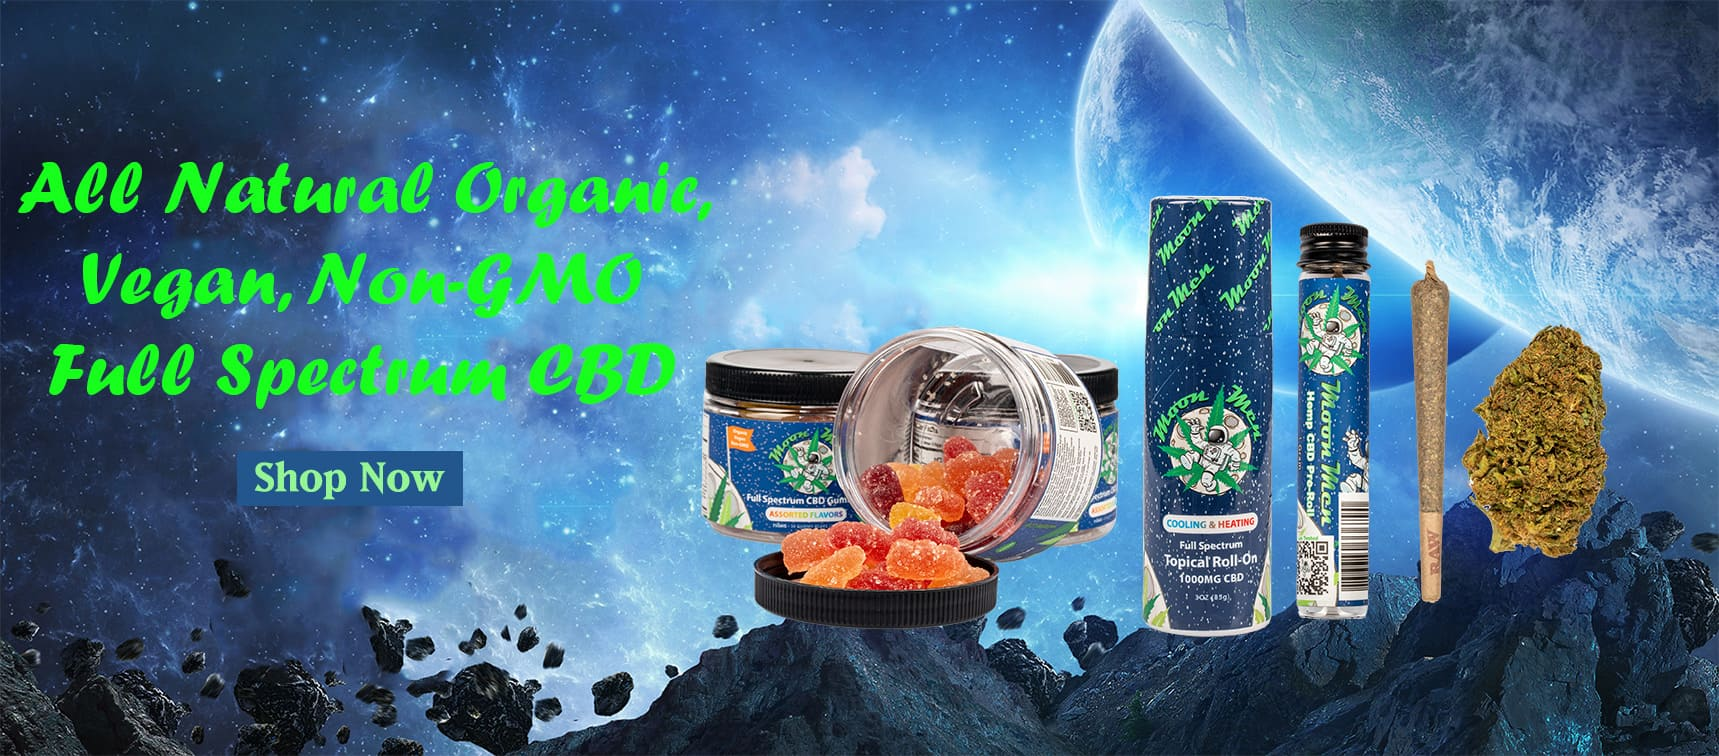 Moon-Men-Products-Header-Overlay-trans-721x